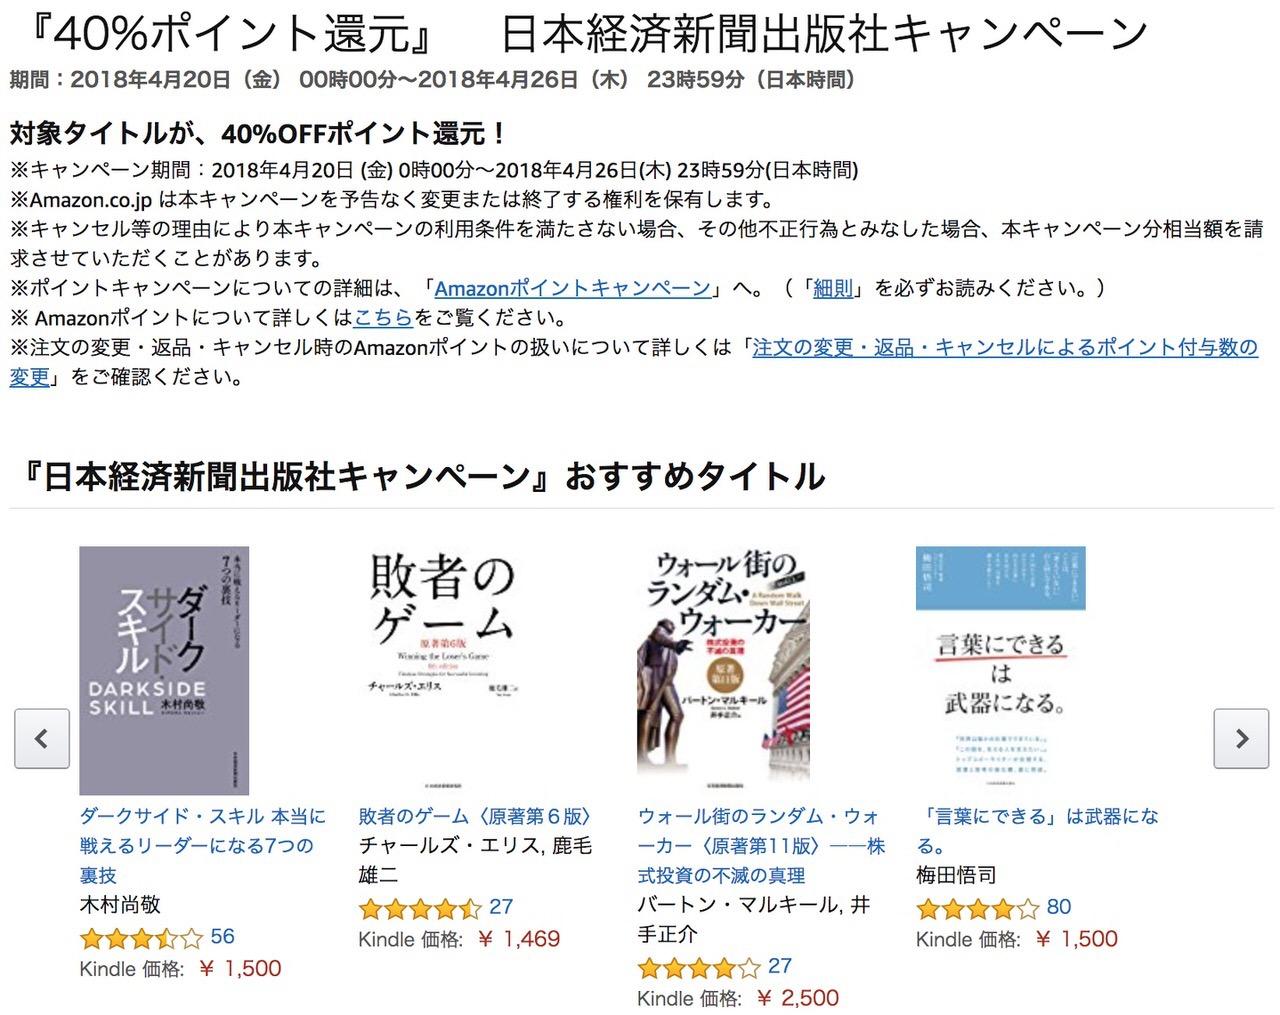 【Kindleセール】40%ポイント還元「日本経済新聞出版社キャンペーン」(4/26まで)